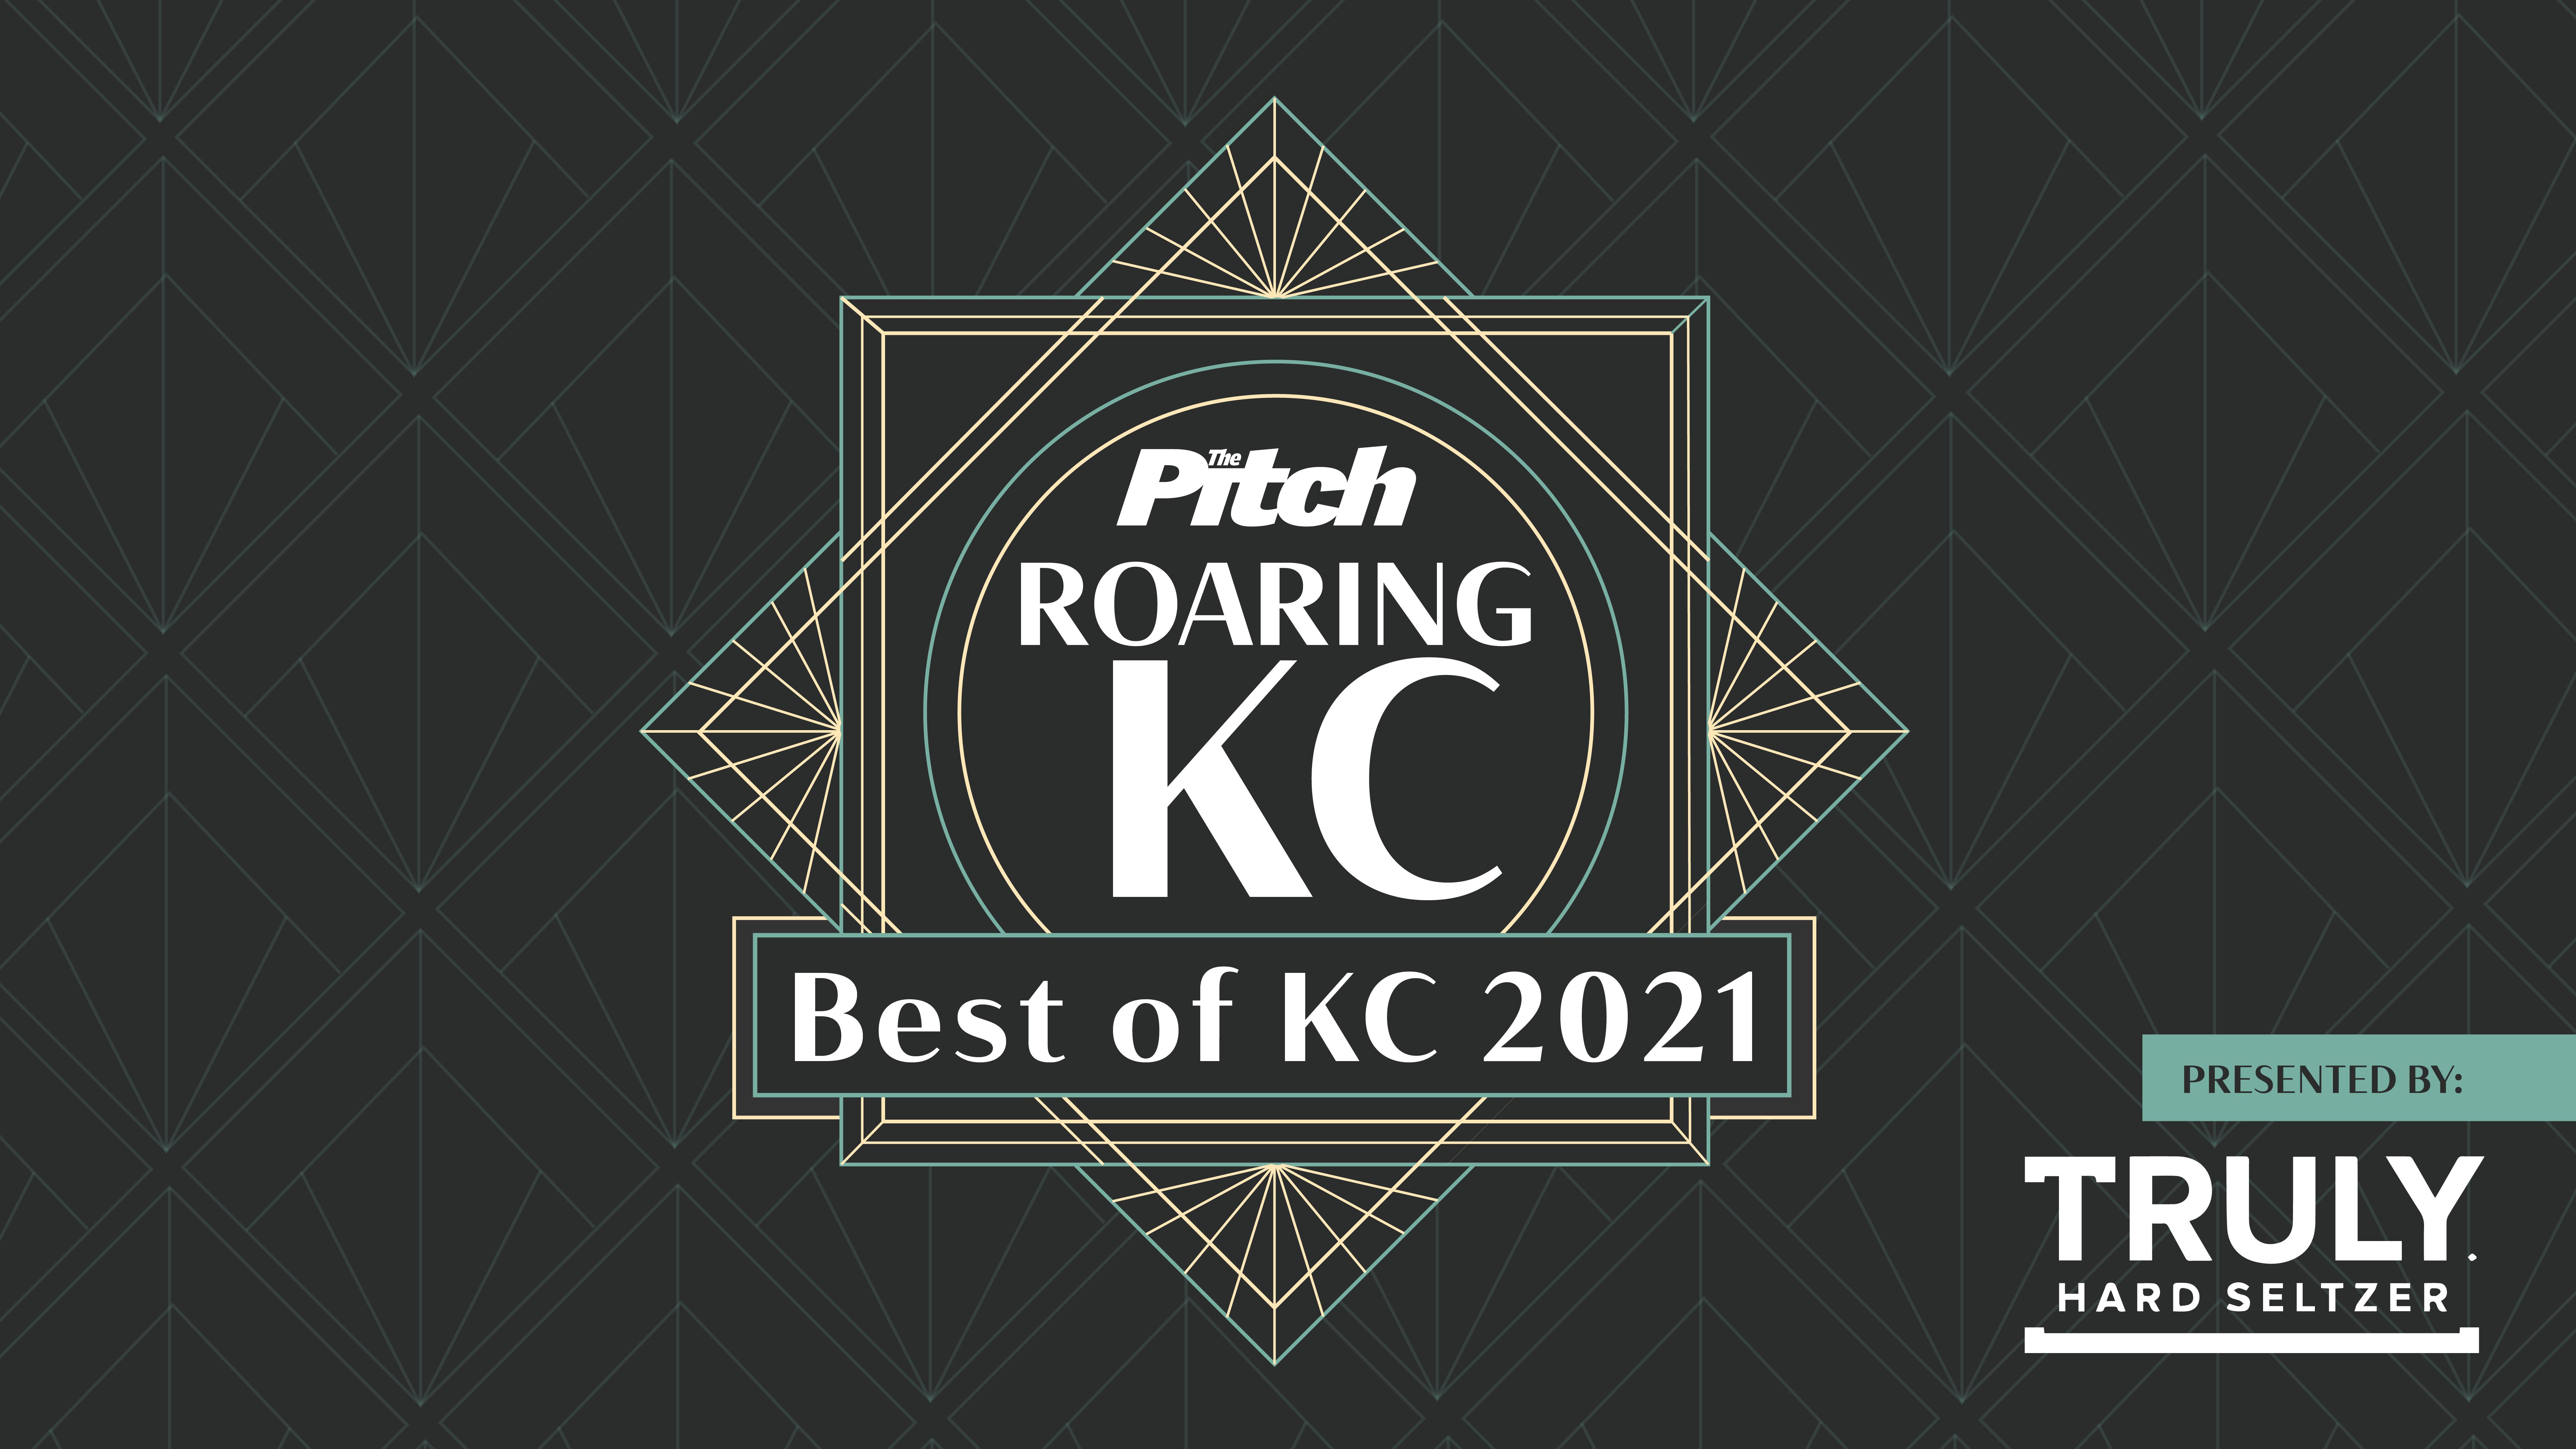 Best Of Kc Editorial Piece Header Image